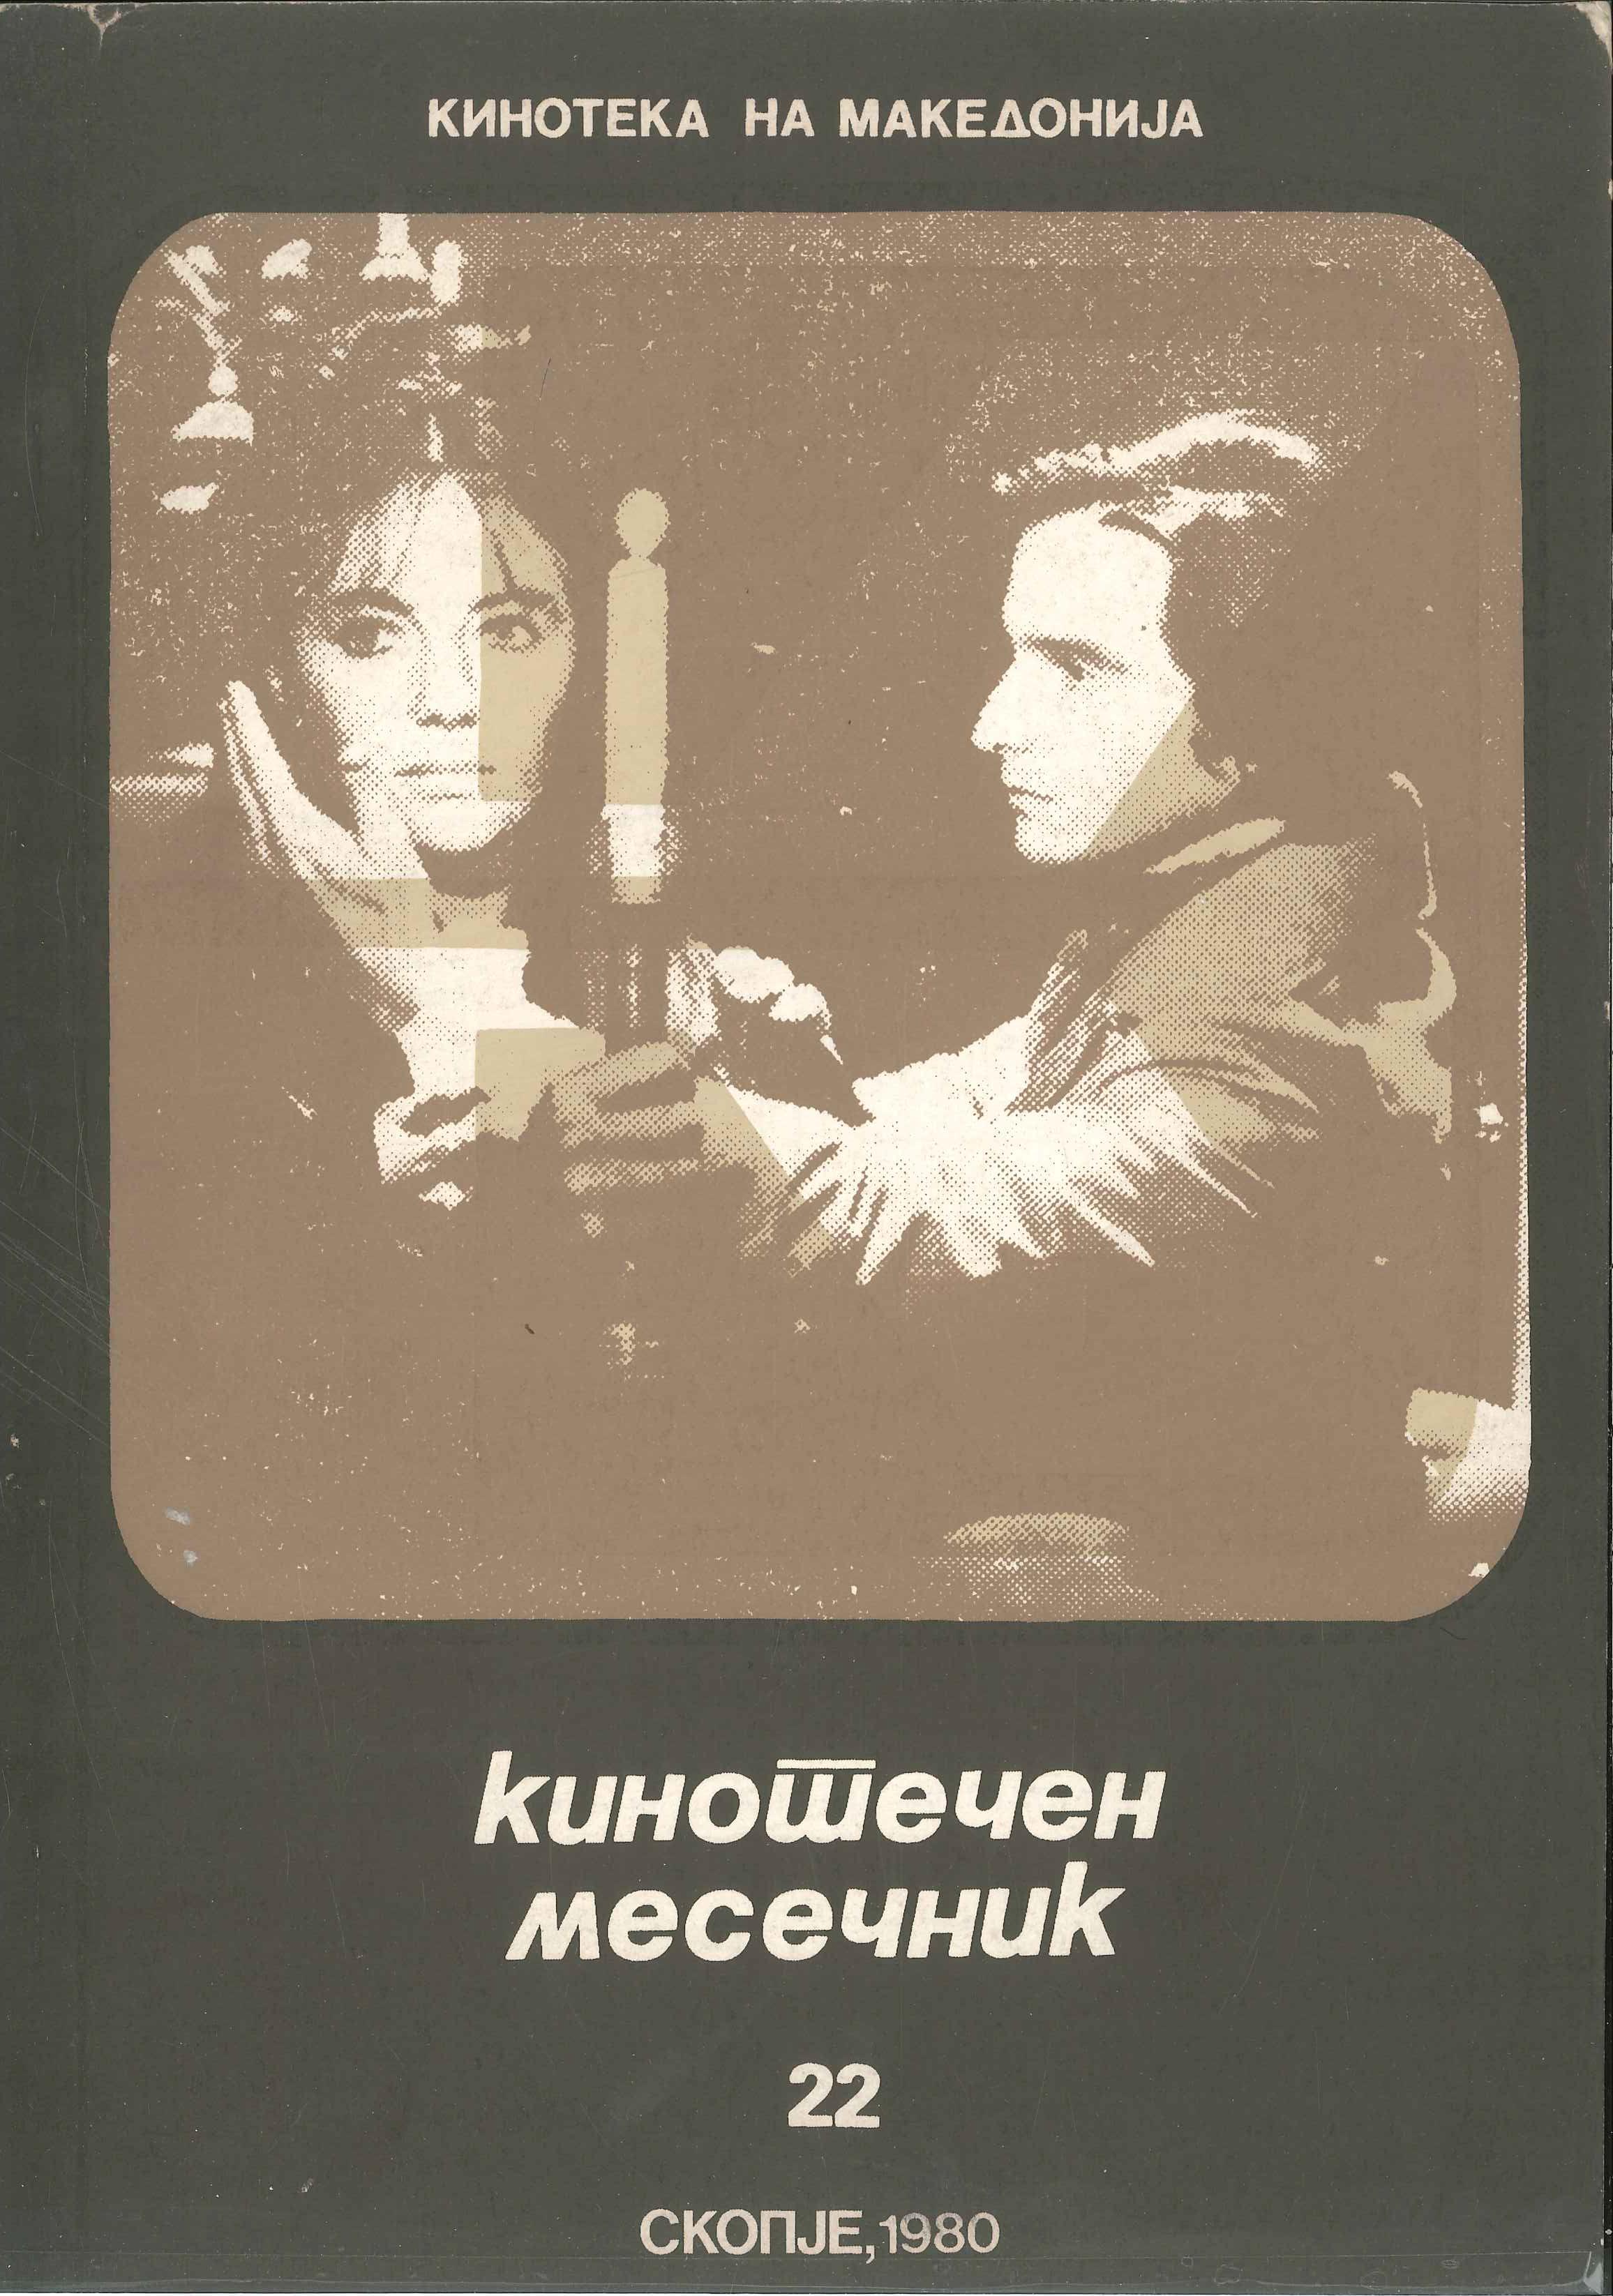 Кинотечен месечник бр. 22